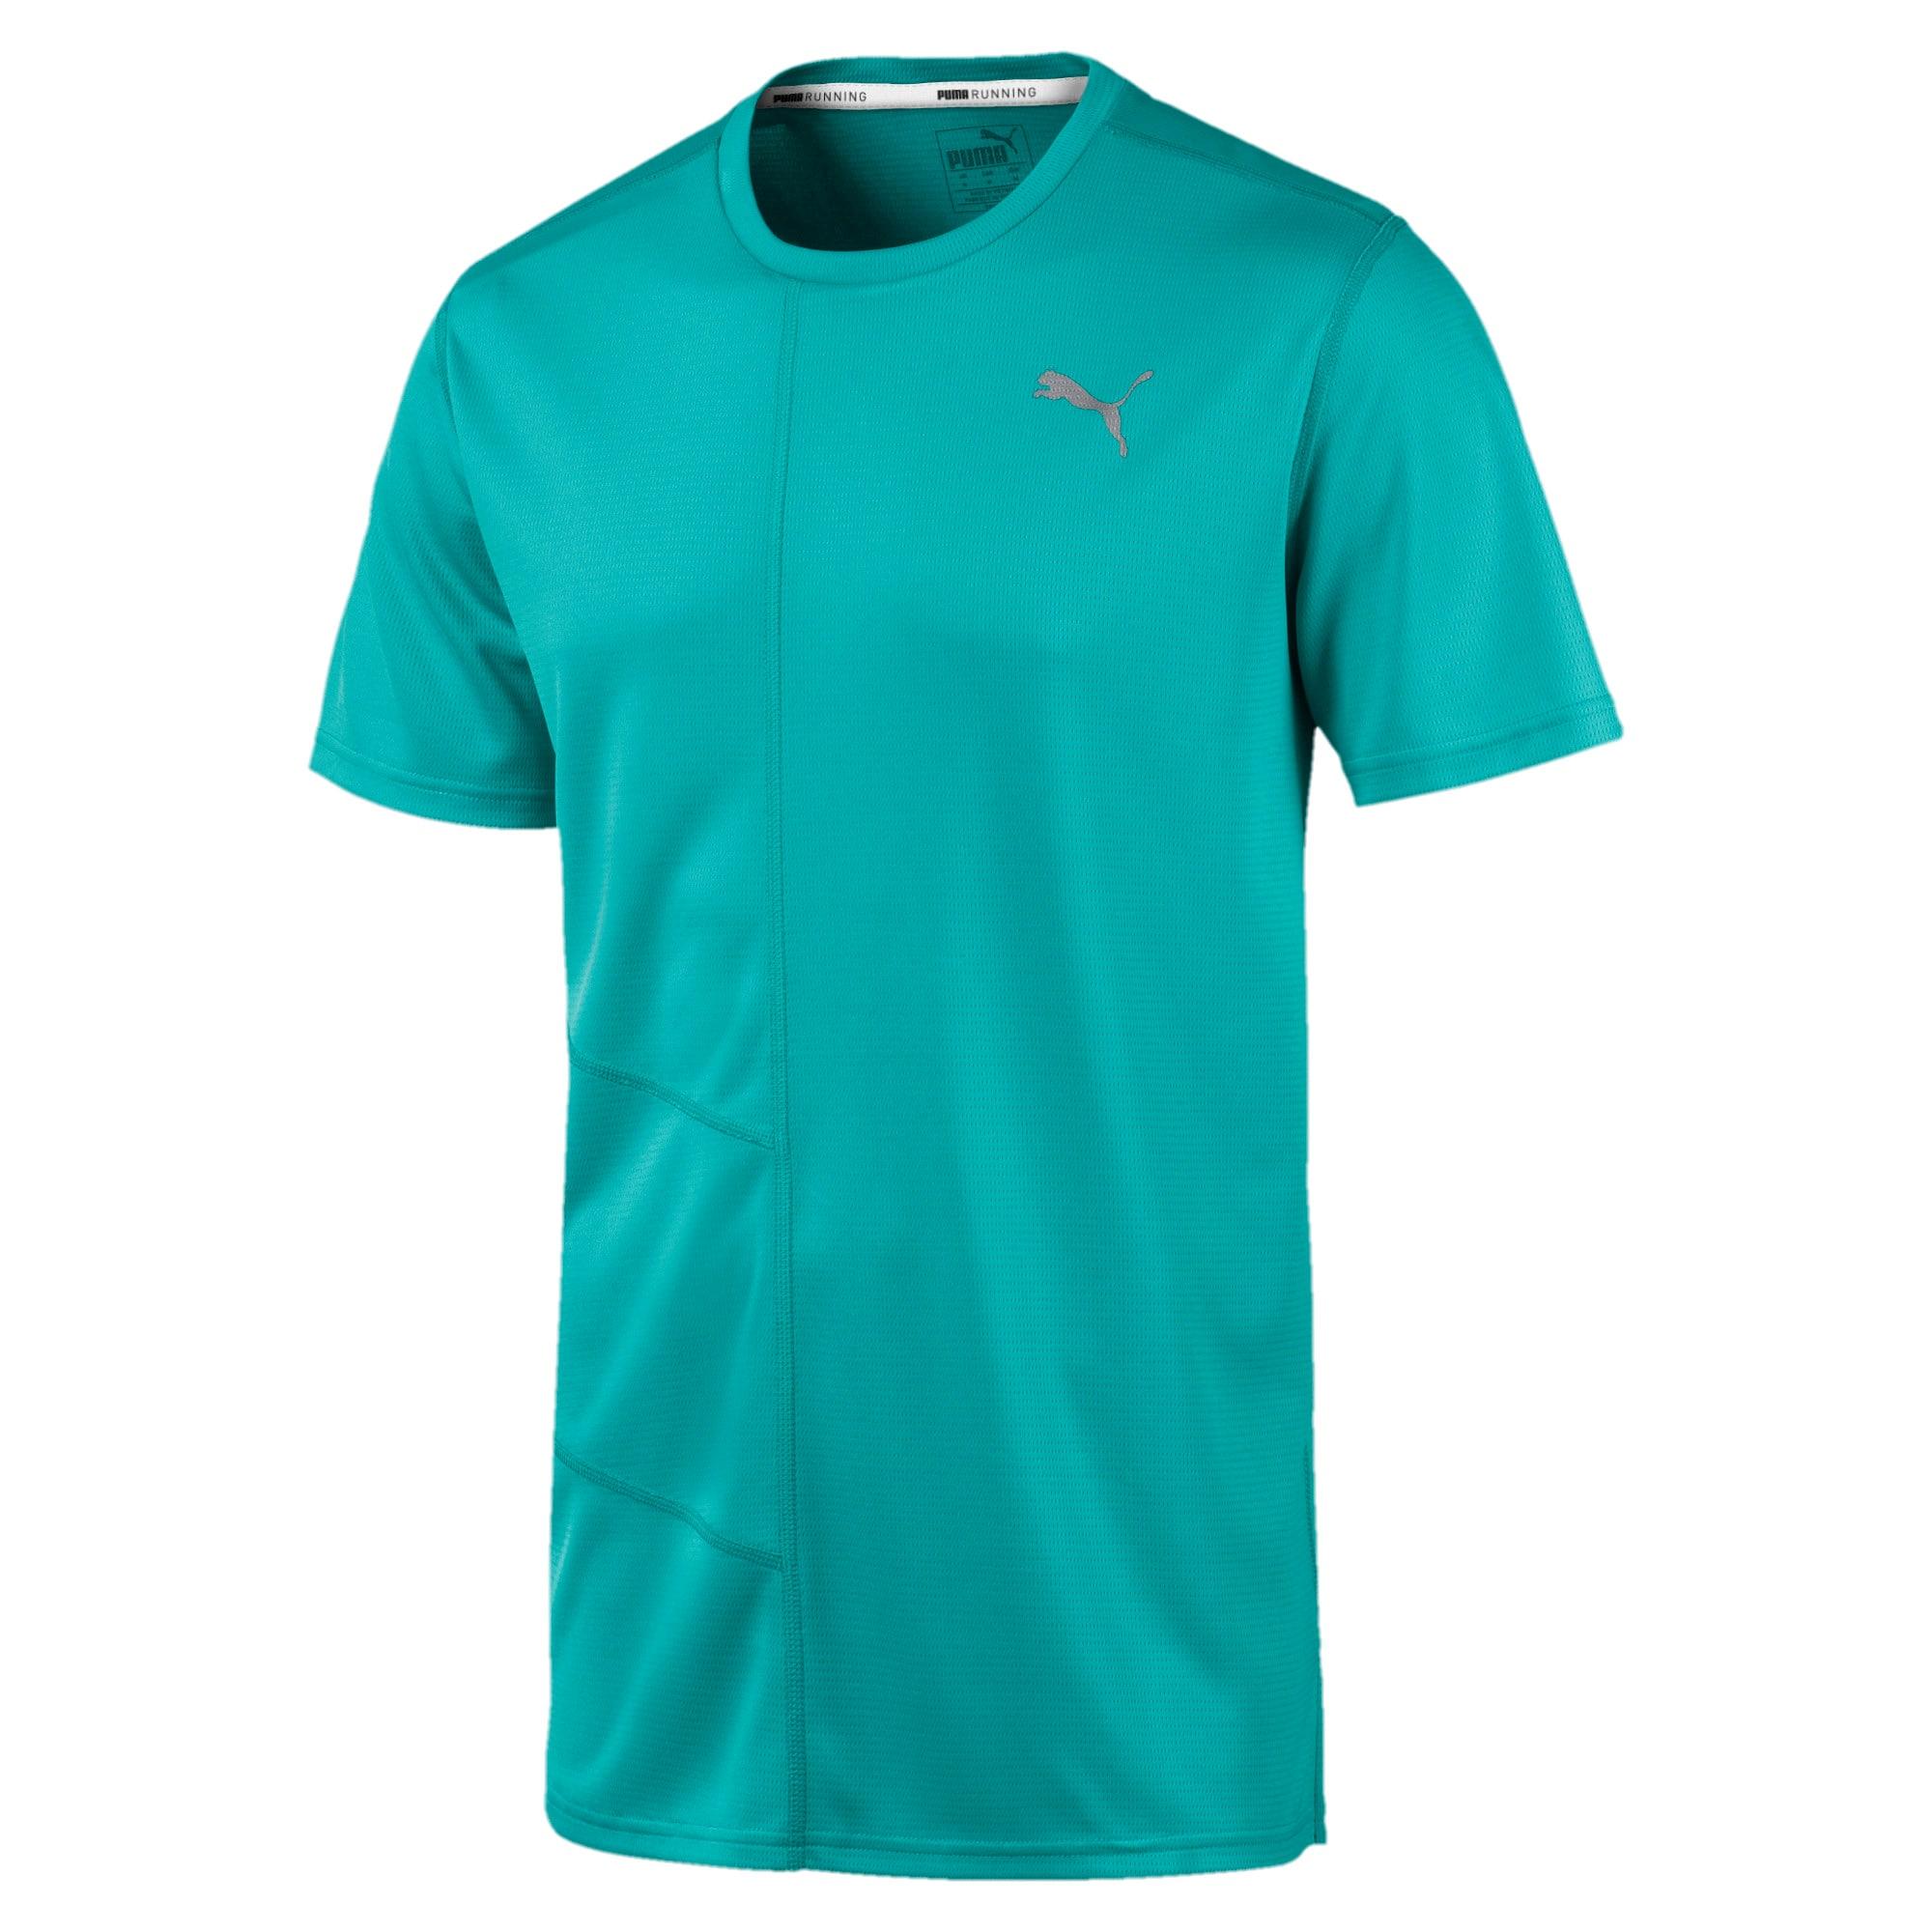 Thumbnail 4 of IGNITE Men's Running T-Shirt, Blue Turquoise, medium